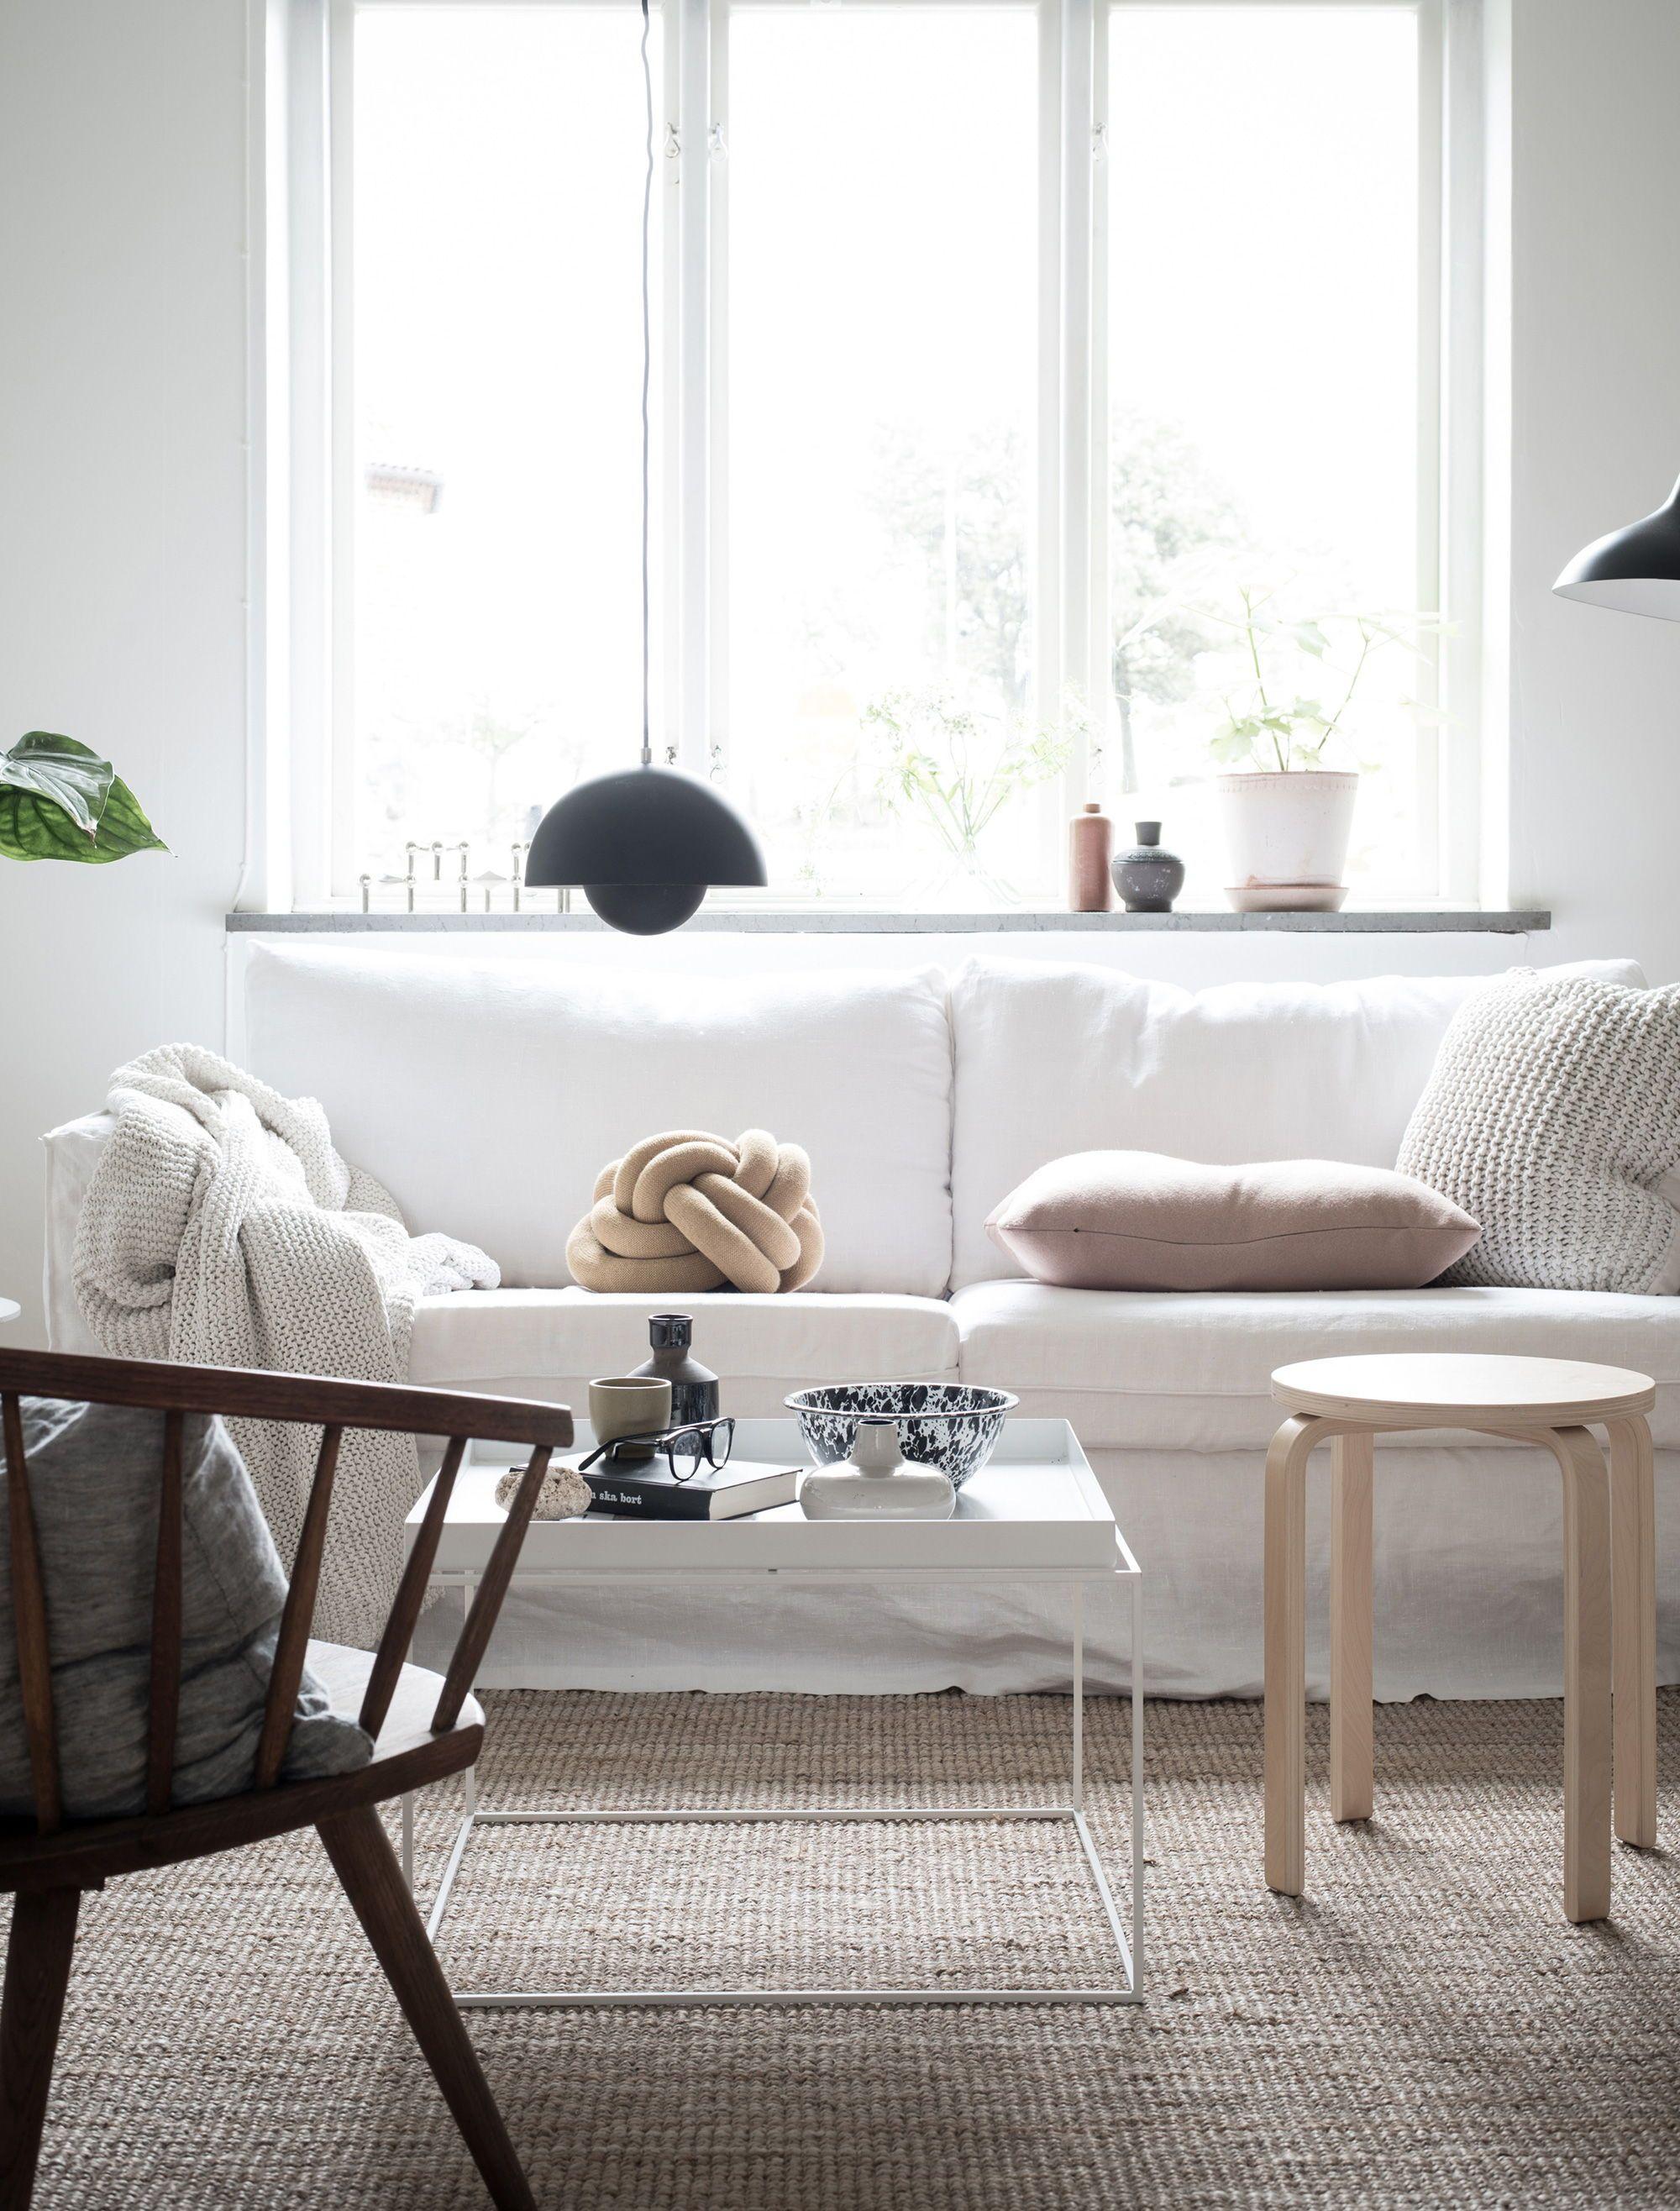 White Scandinavian Minimalism White Linen Sofa Black Accents Add A Modern G White Furniture Living Room Minimalist Living Room Decor Minimalist Living Room